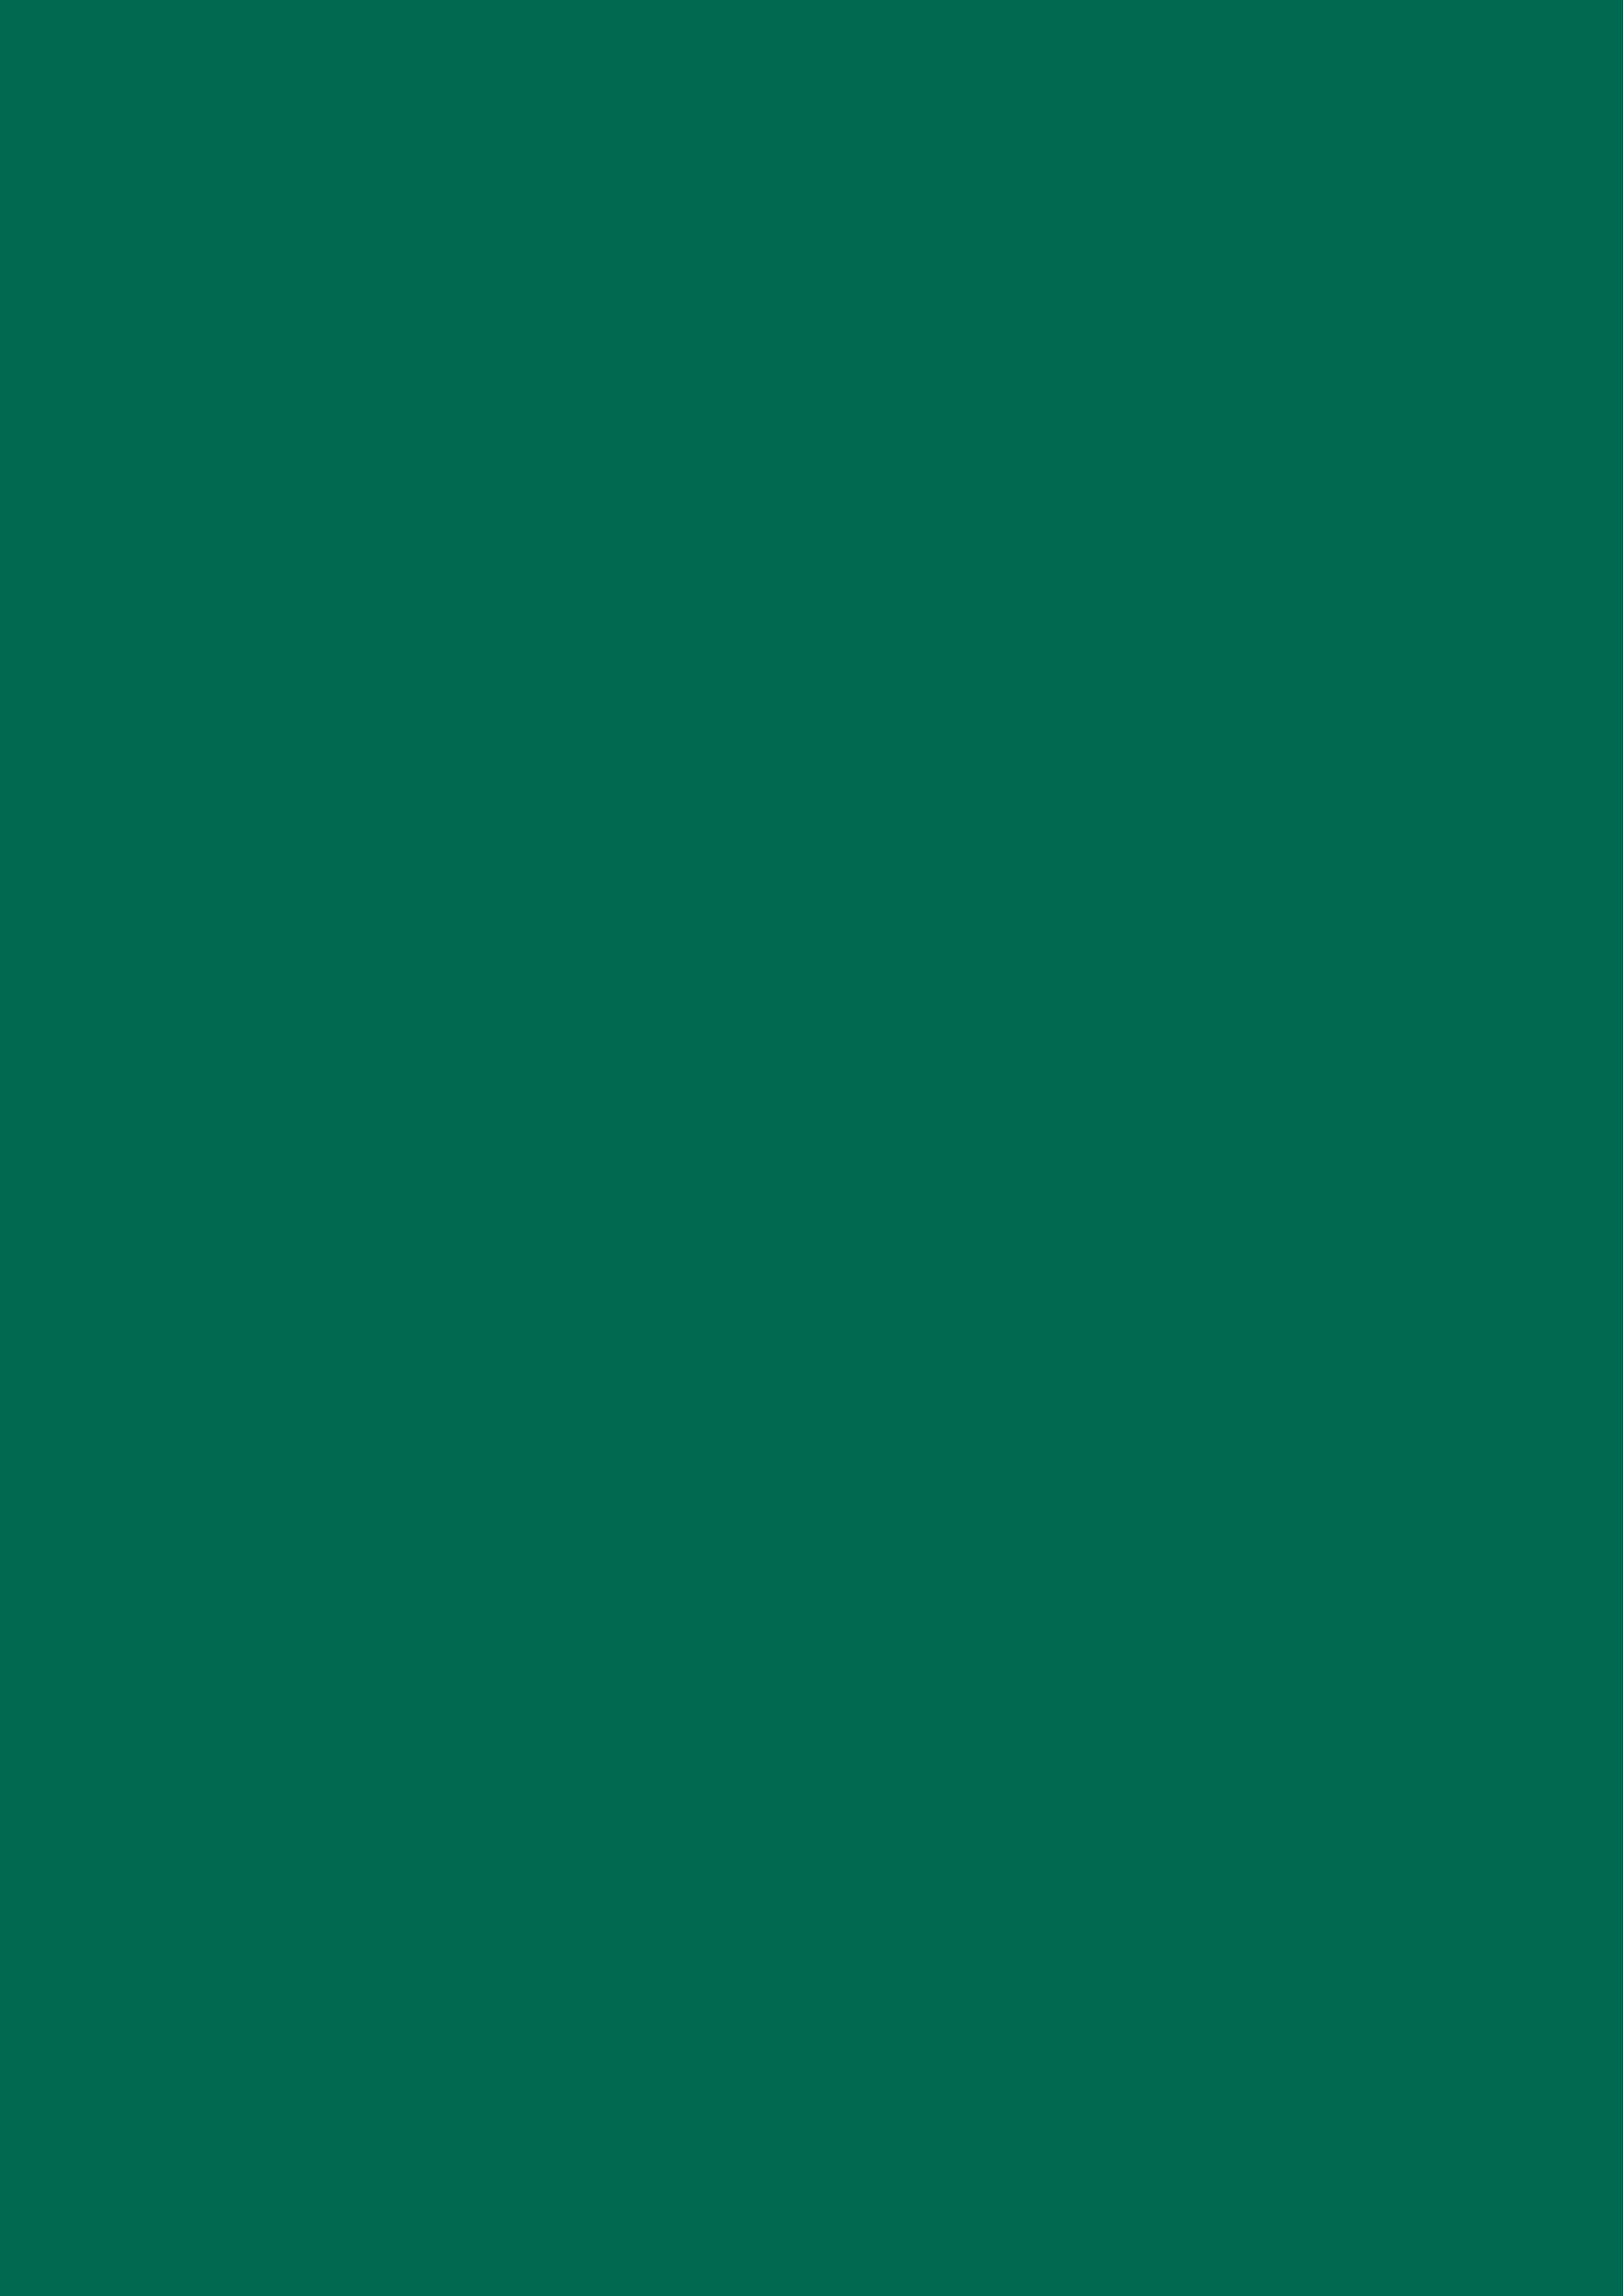 2480x3508 Bottle Green Solid Color Background